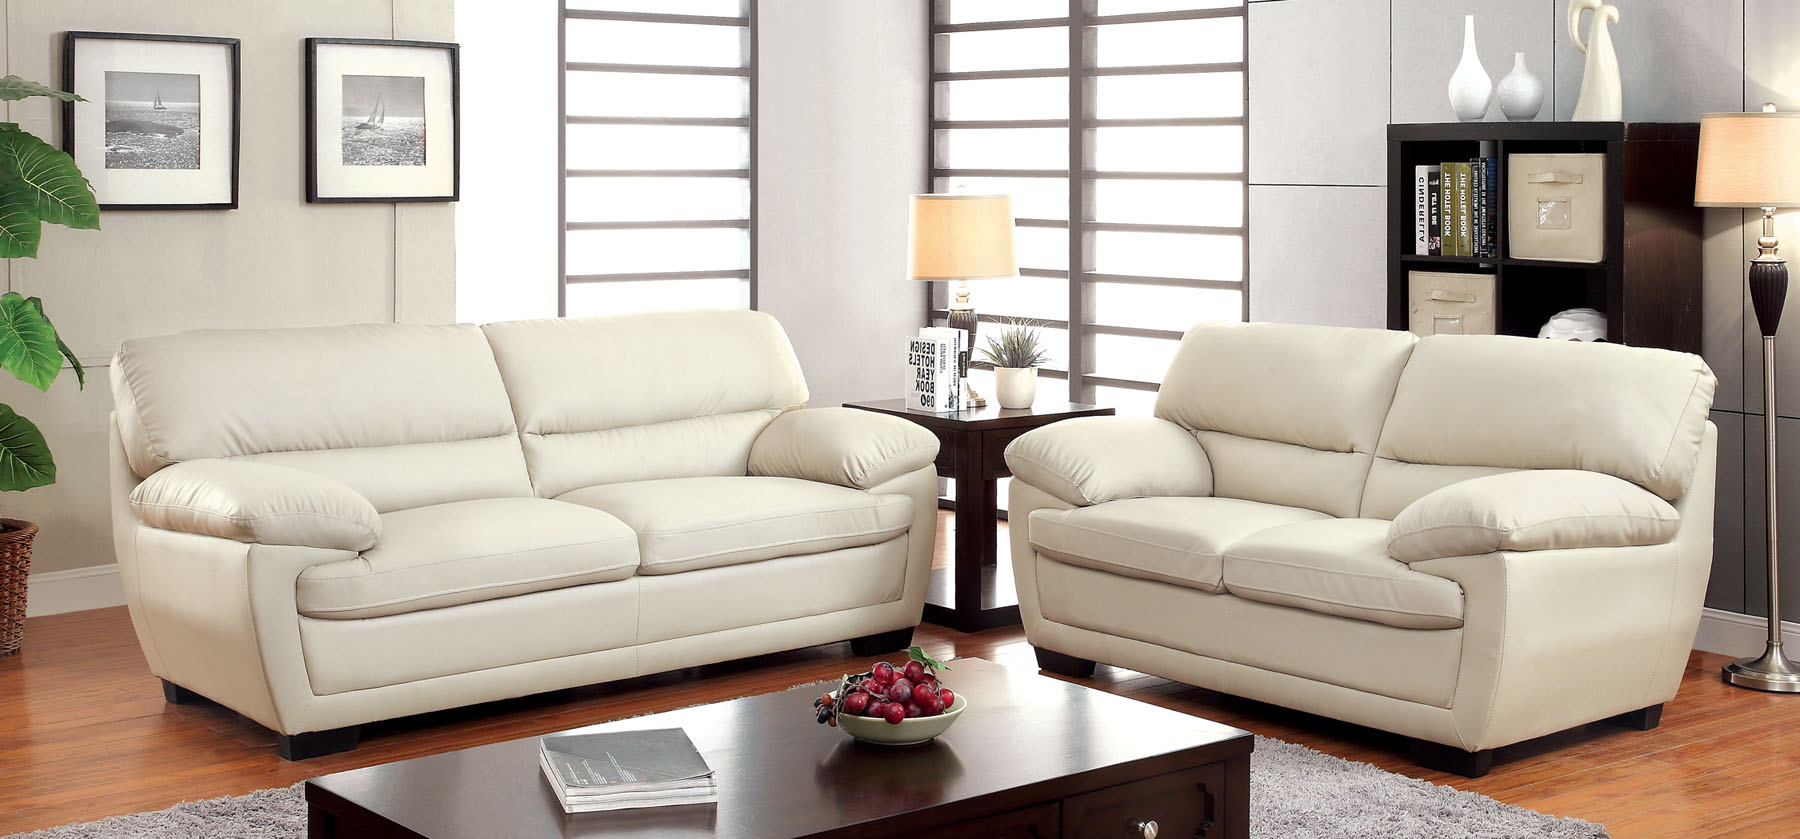 MULLINS | Live It Up Furniture